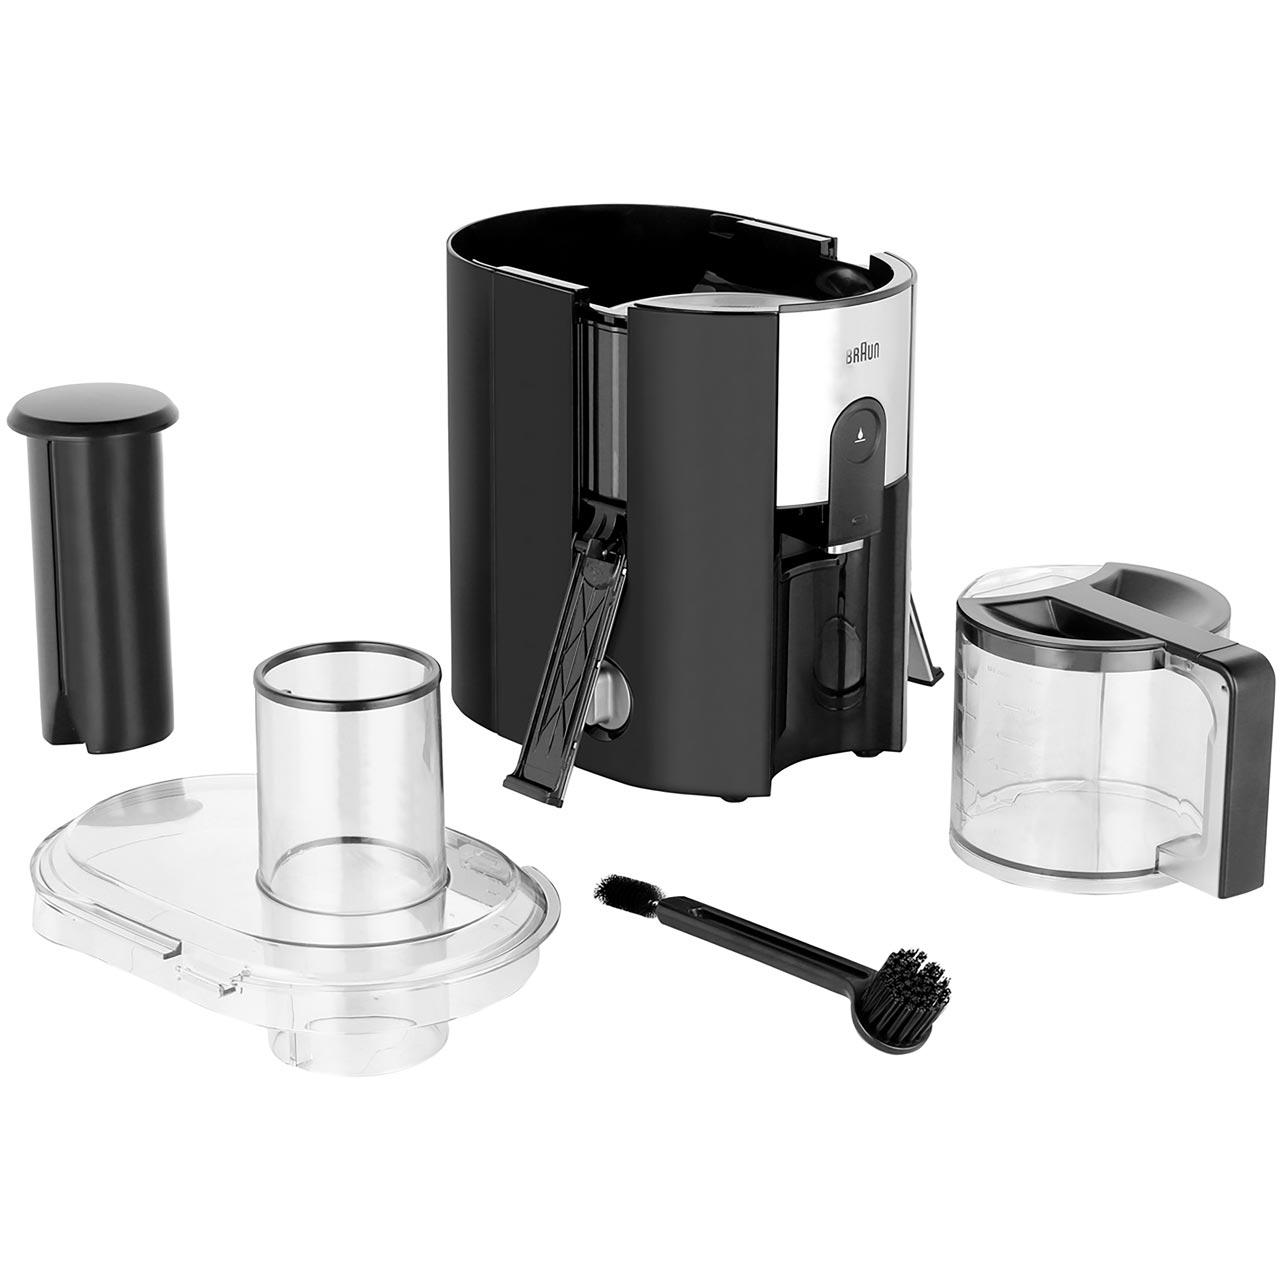 Braun Multiquick J500 Centrifugal Juicer Black